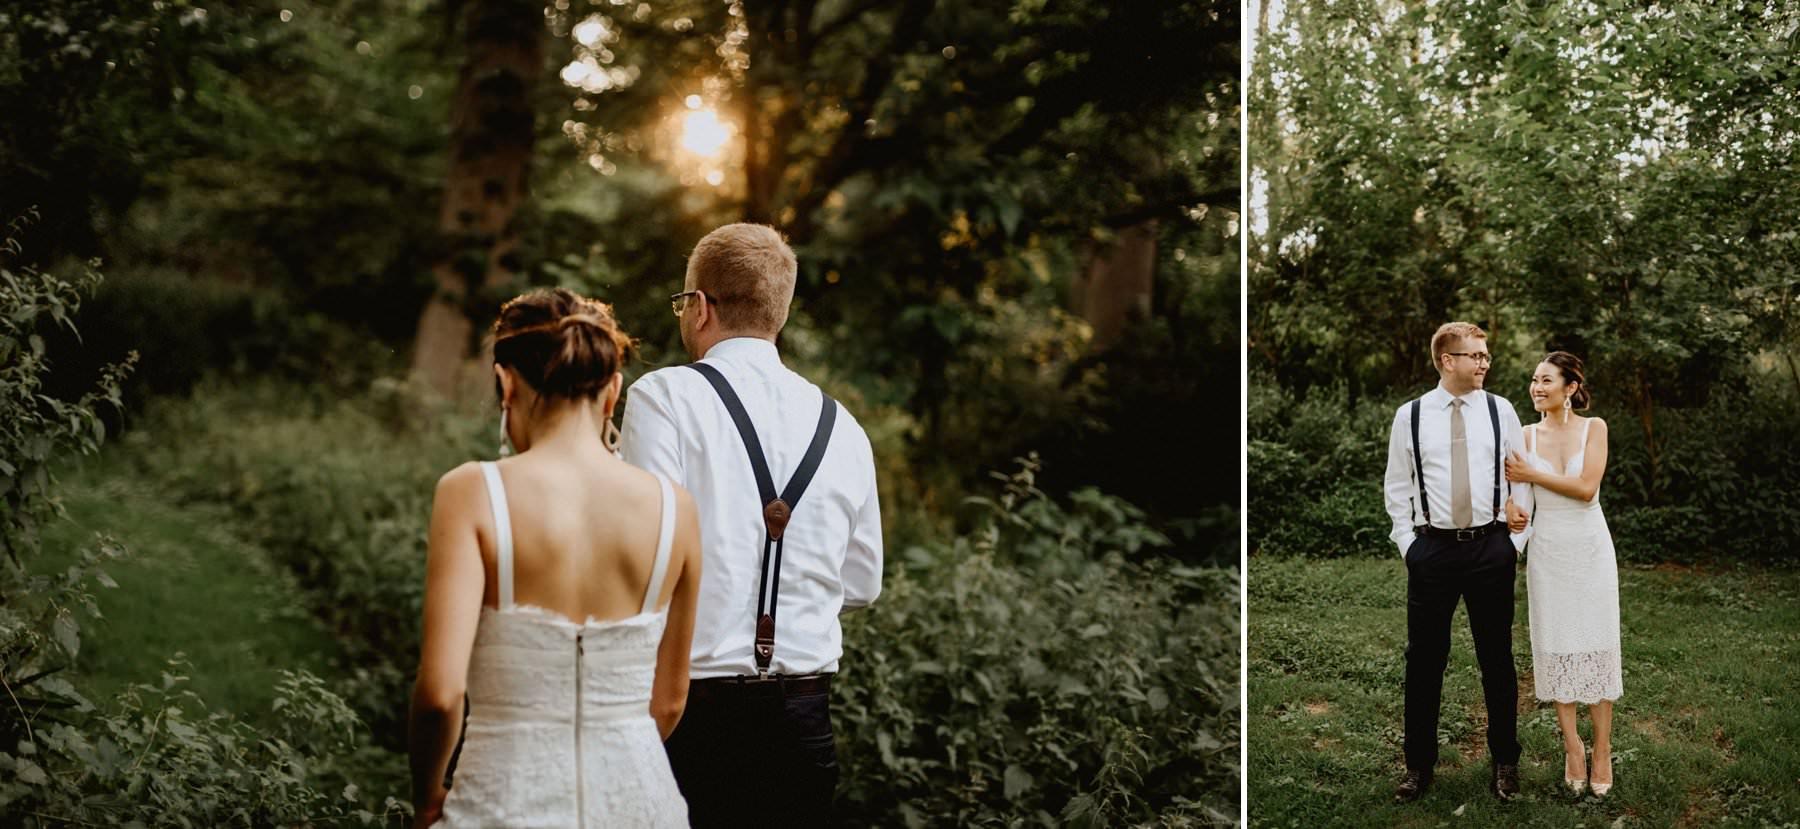 Appleford-estate-wedding-136.jpg